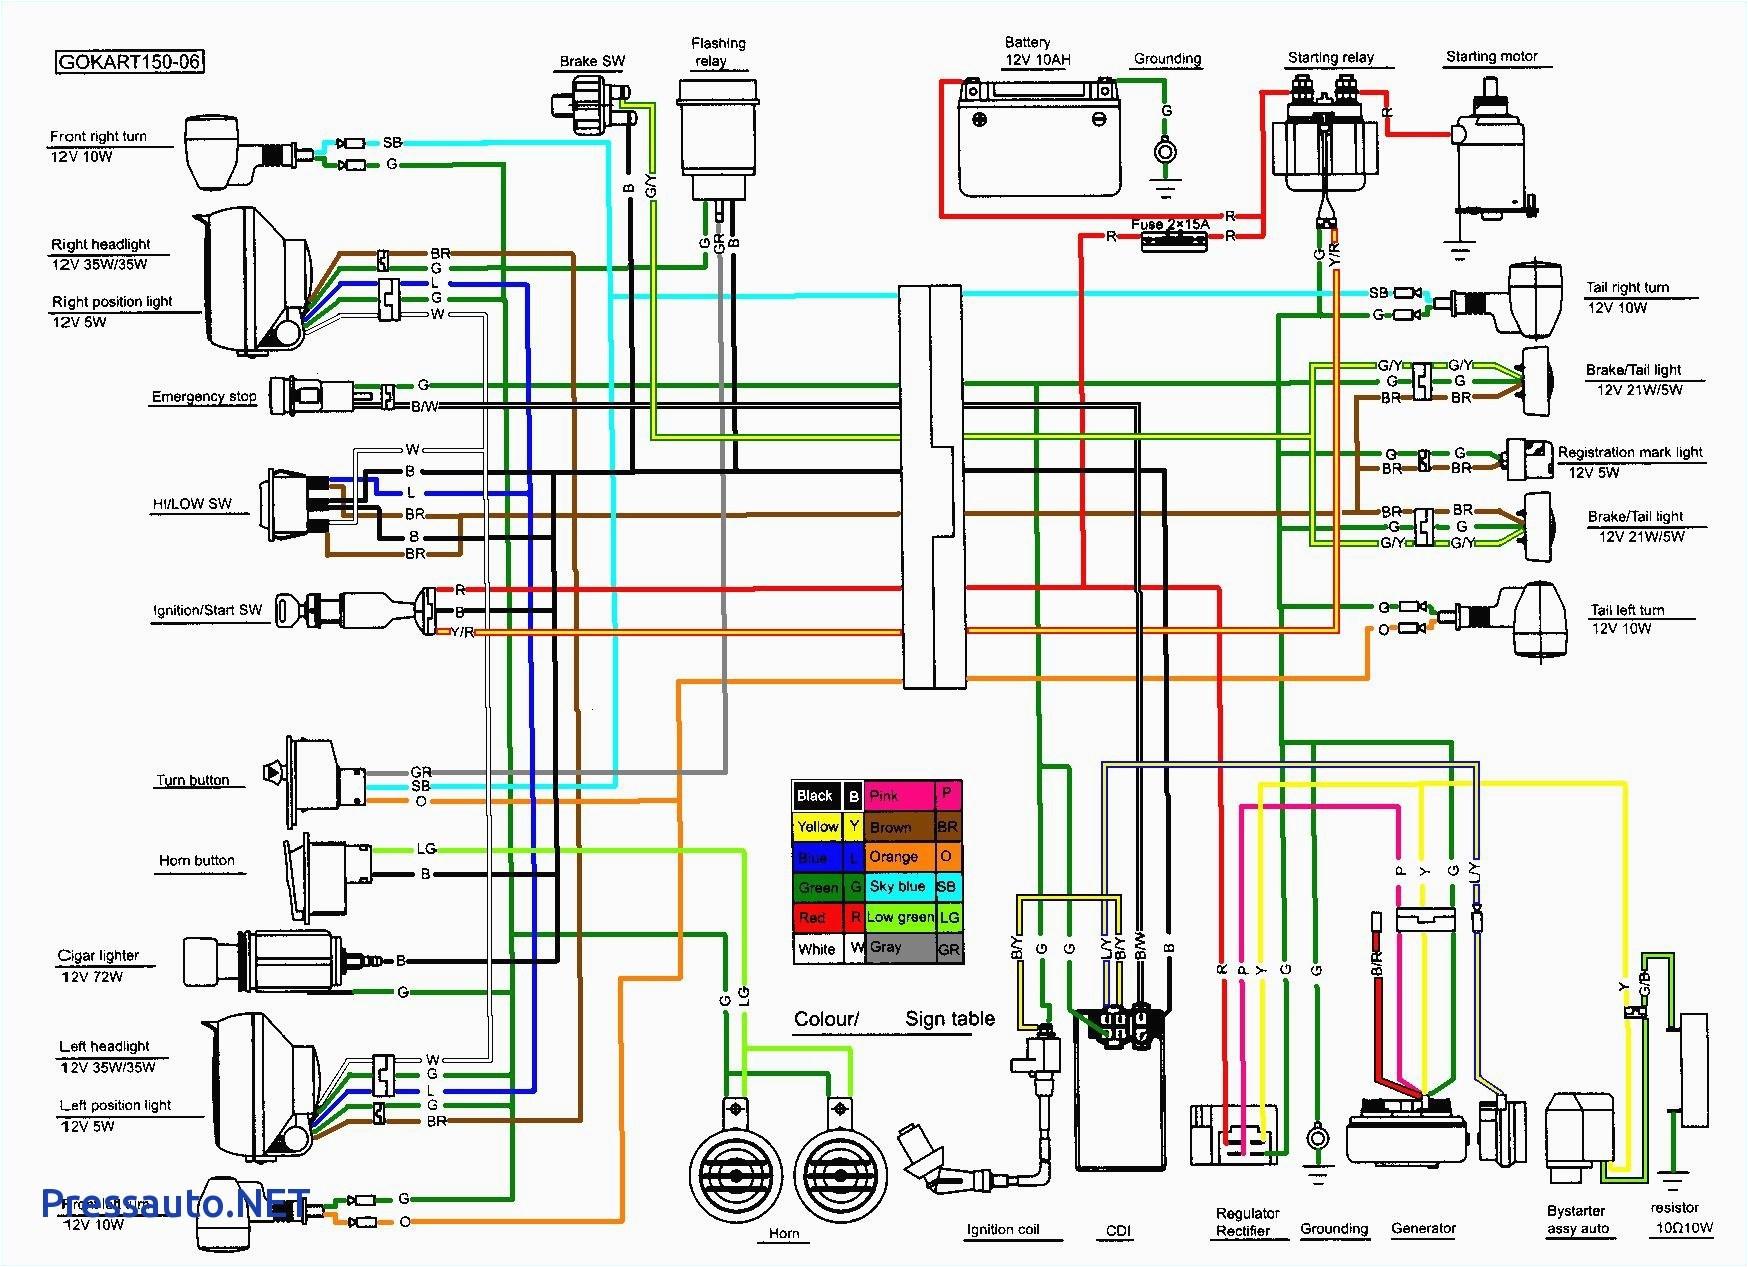 saty atv with remote wiring wiring diagram used 110 atv wiring diagram 2001